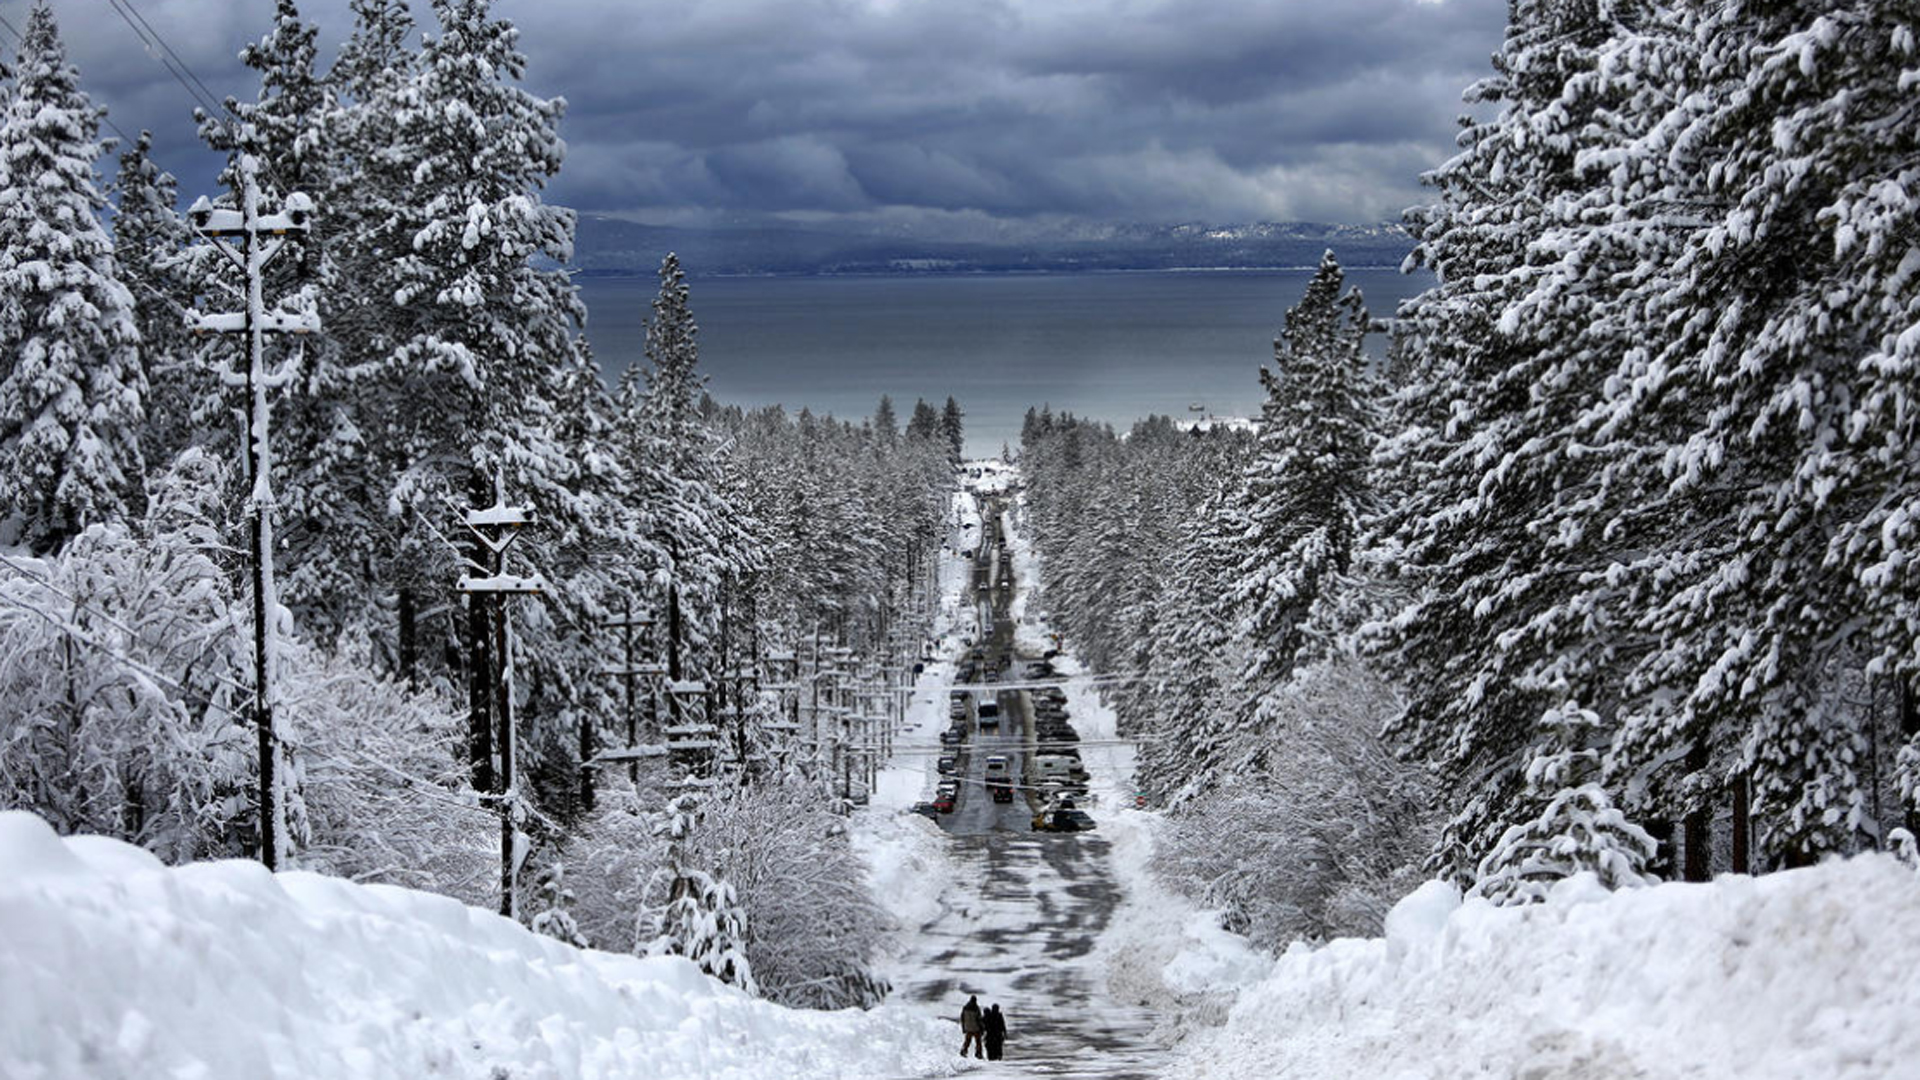 A January 2017 storm dropped large amounts of snow along Ski Run Boulevard in South Lake Tahoe. (Credit: Gary Coronado / Los Angeles Times)